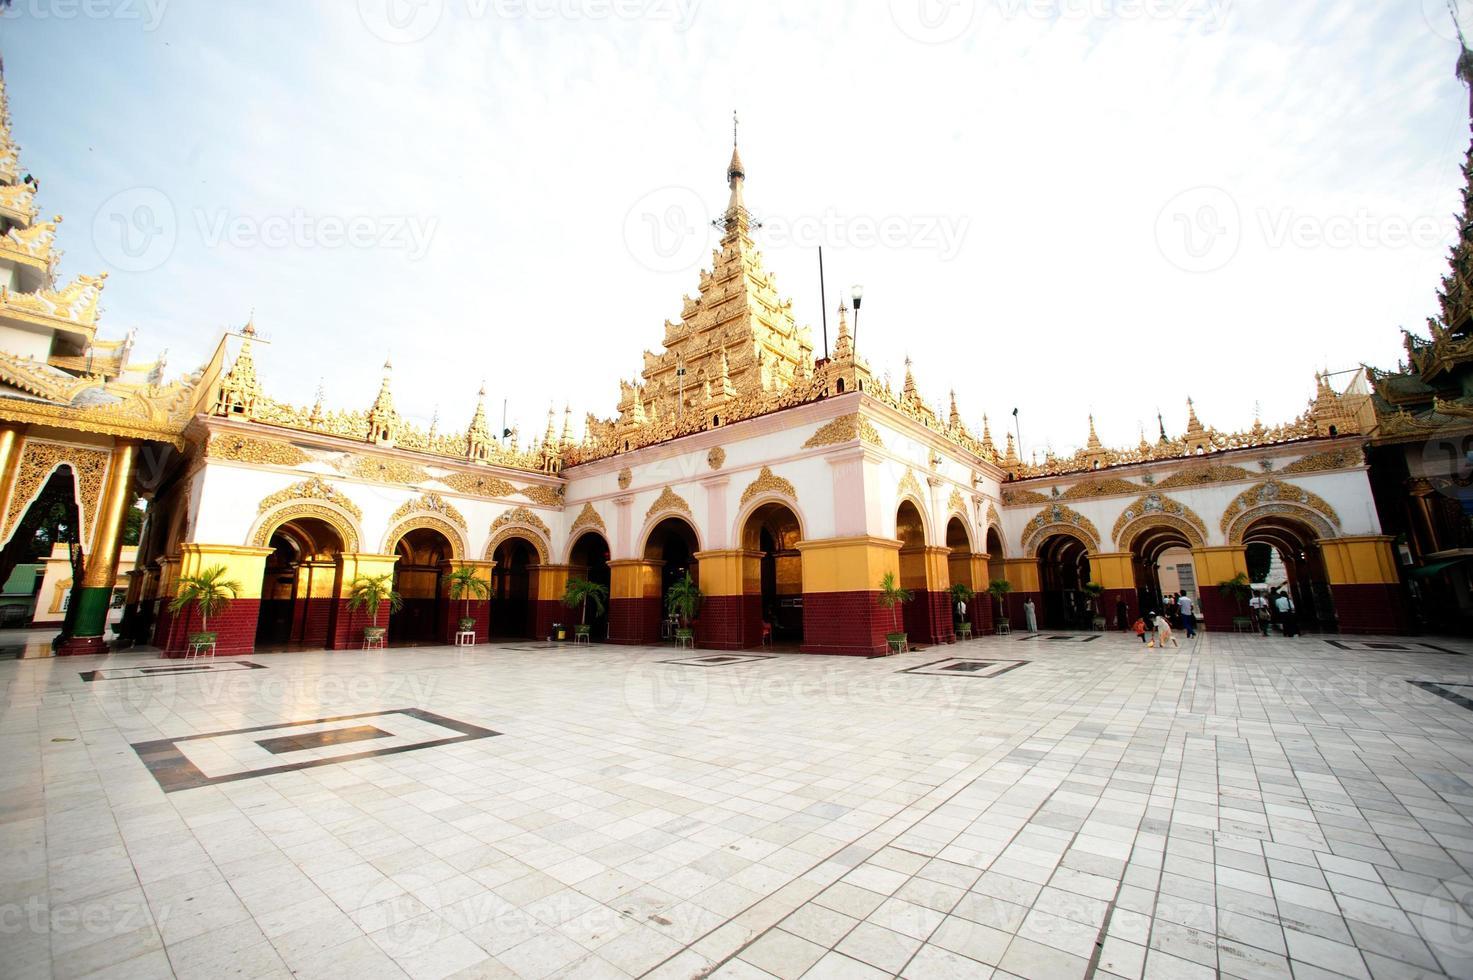 Pagoda di Maha Muni nella città di Mandalay, Myanmar. foto